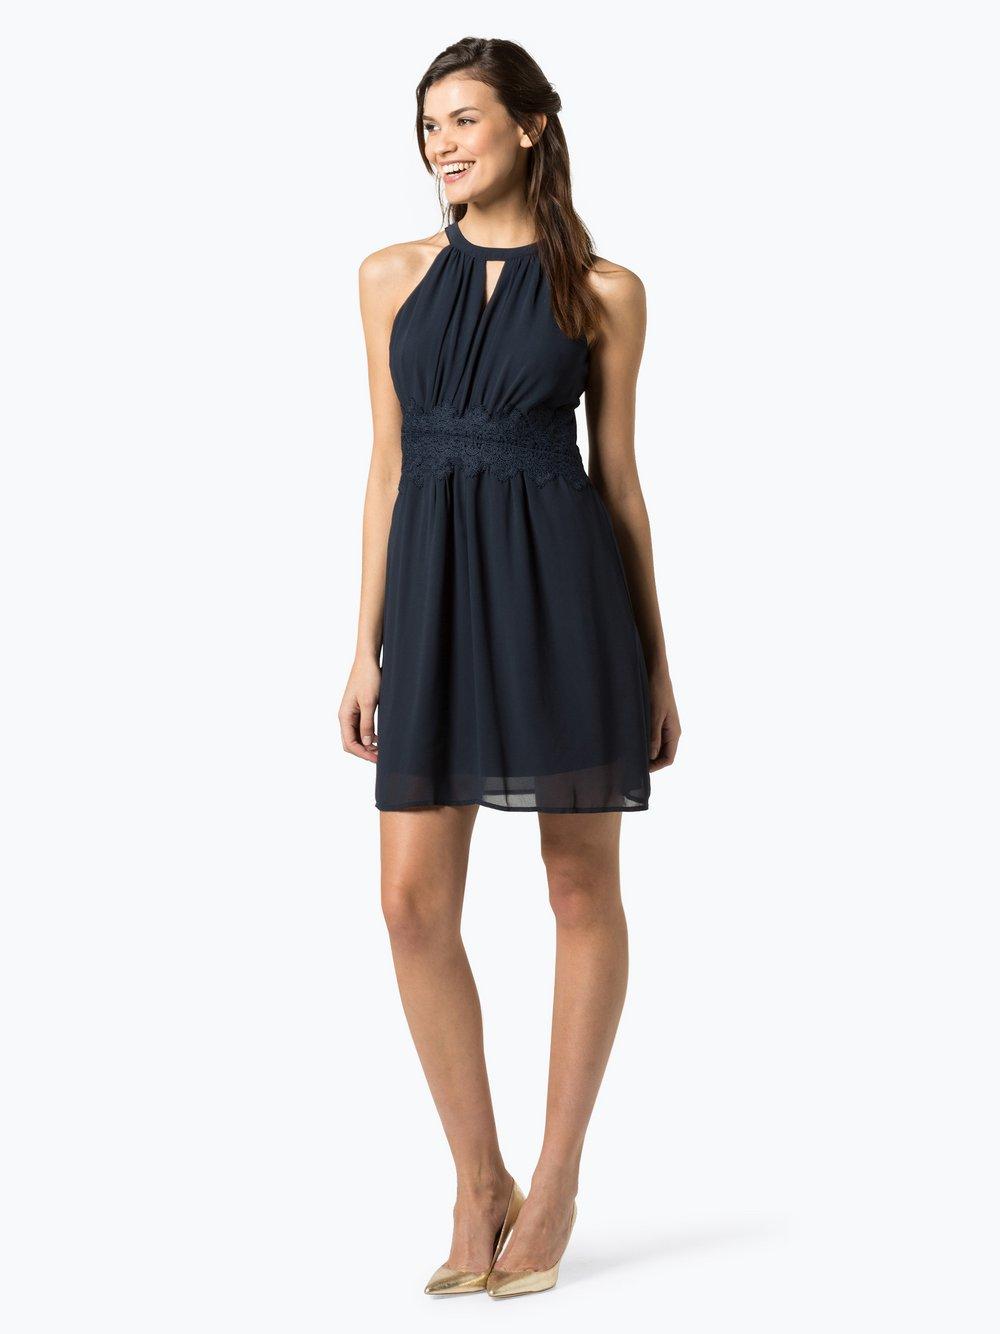 Vila - Damska sukienka wieczorowa – Vimilina, niebieski Vila